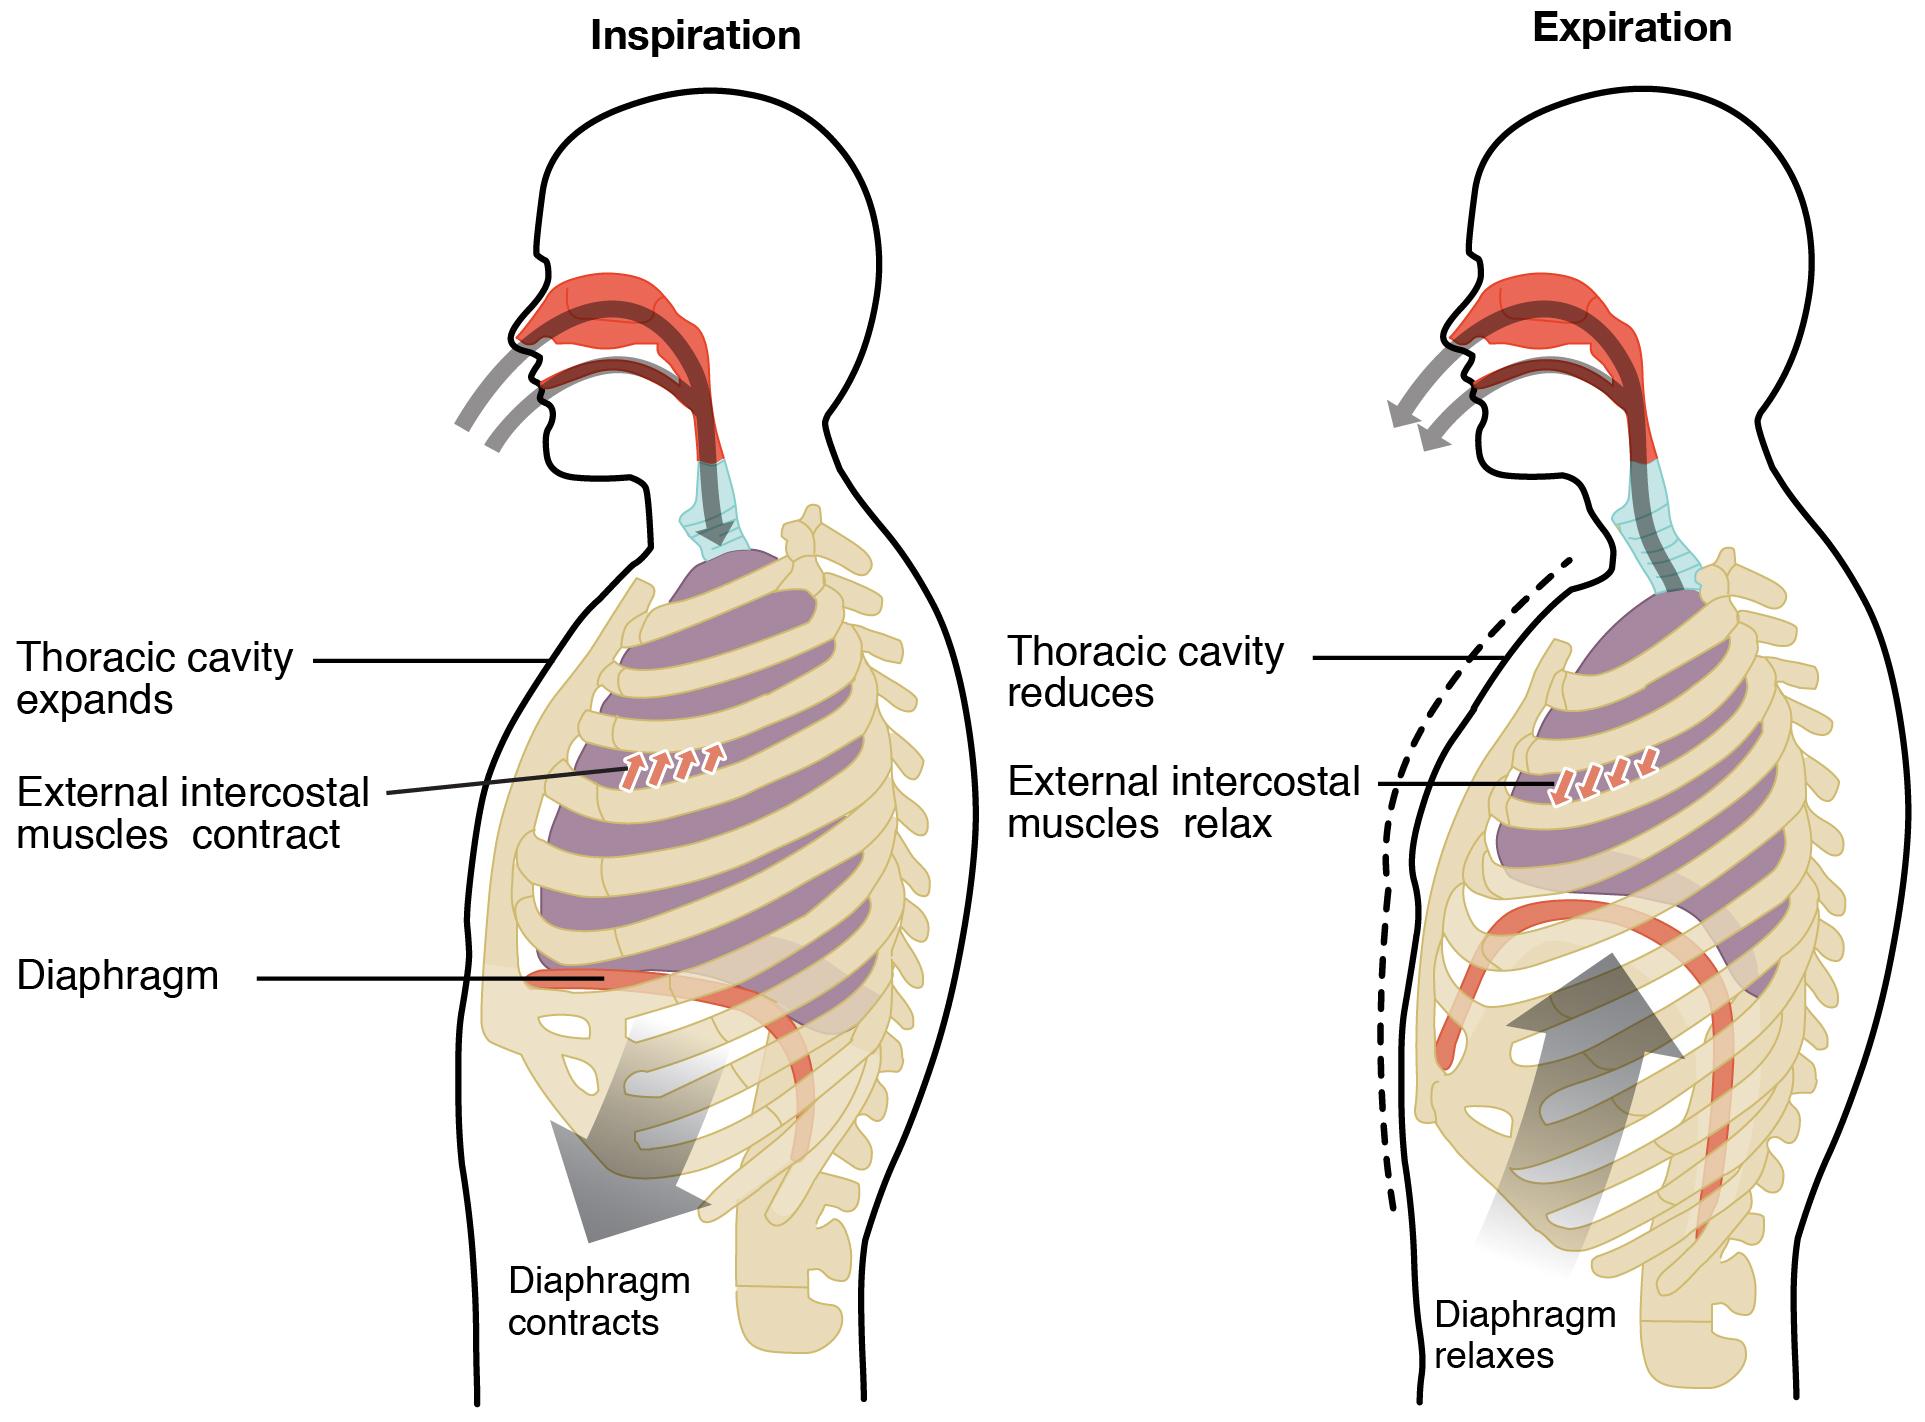 Inspiration and expiration process diagram. Image description available.